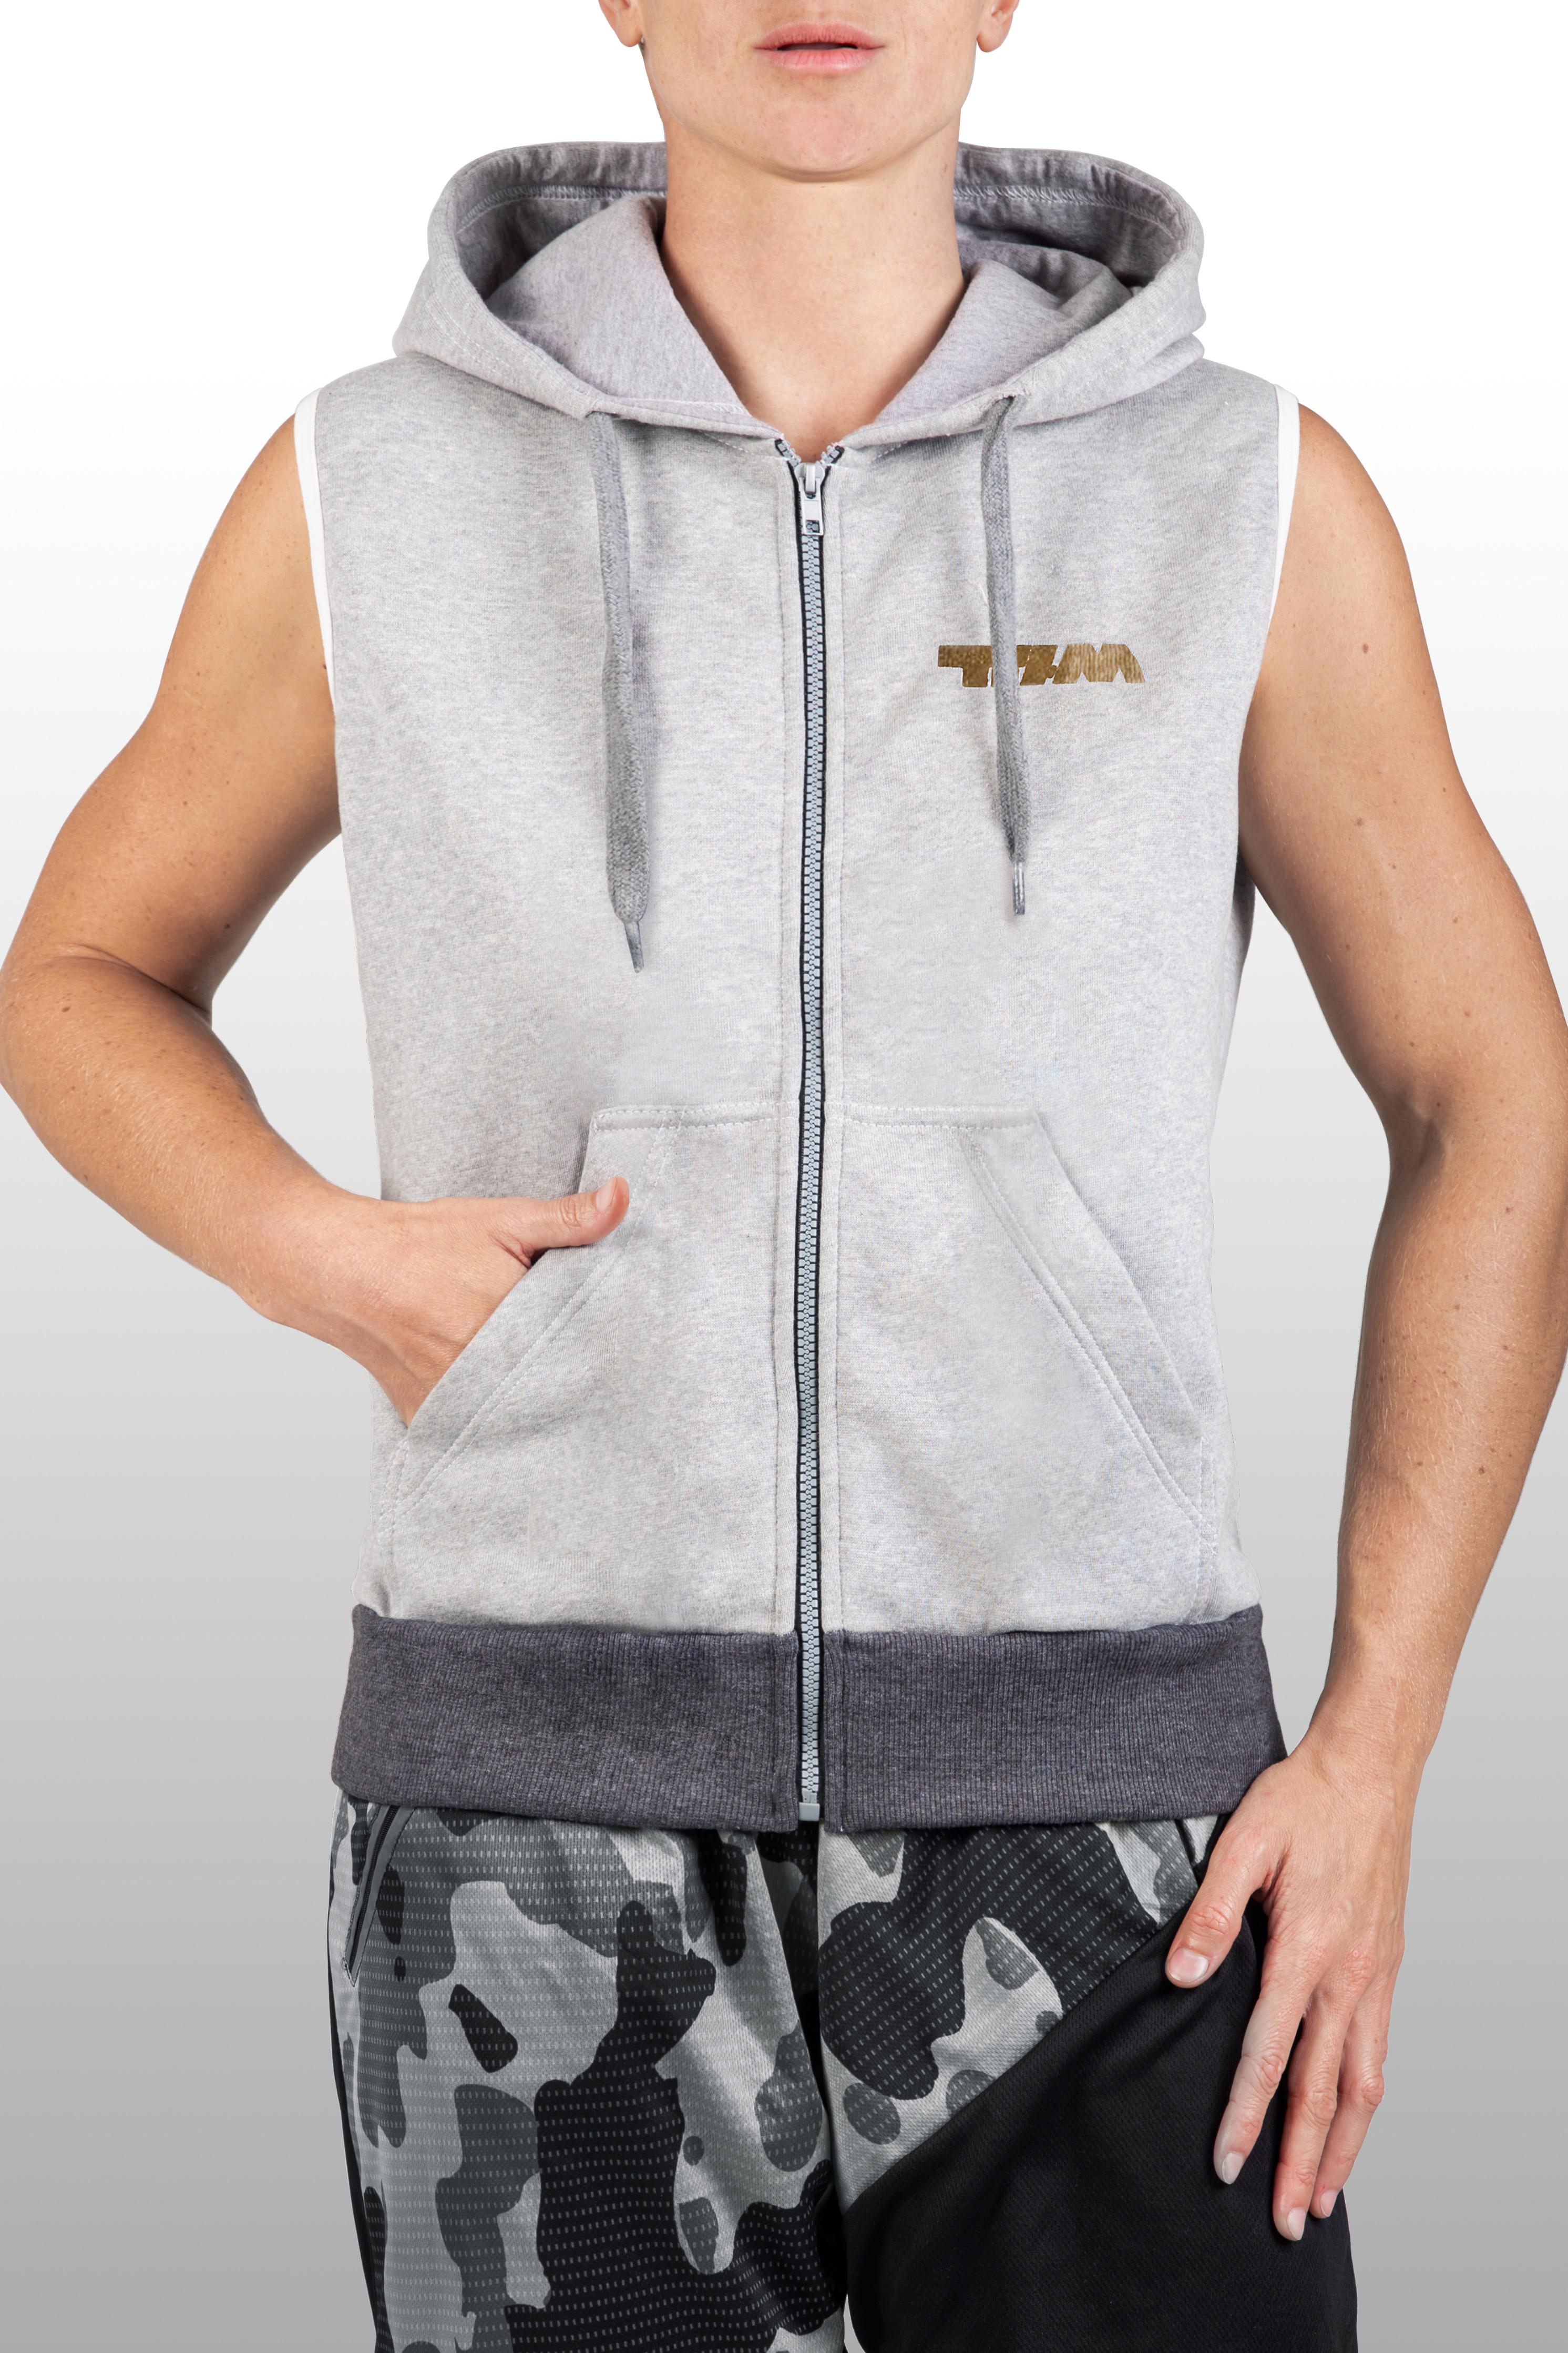 2xME unisex hoodie light grey B_2xme_M_19_01grey